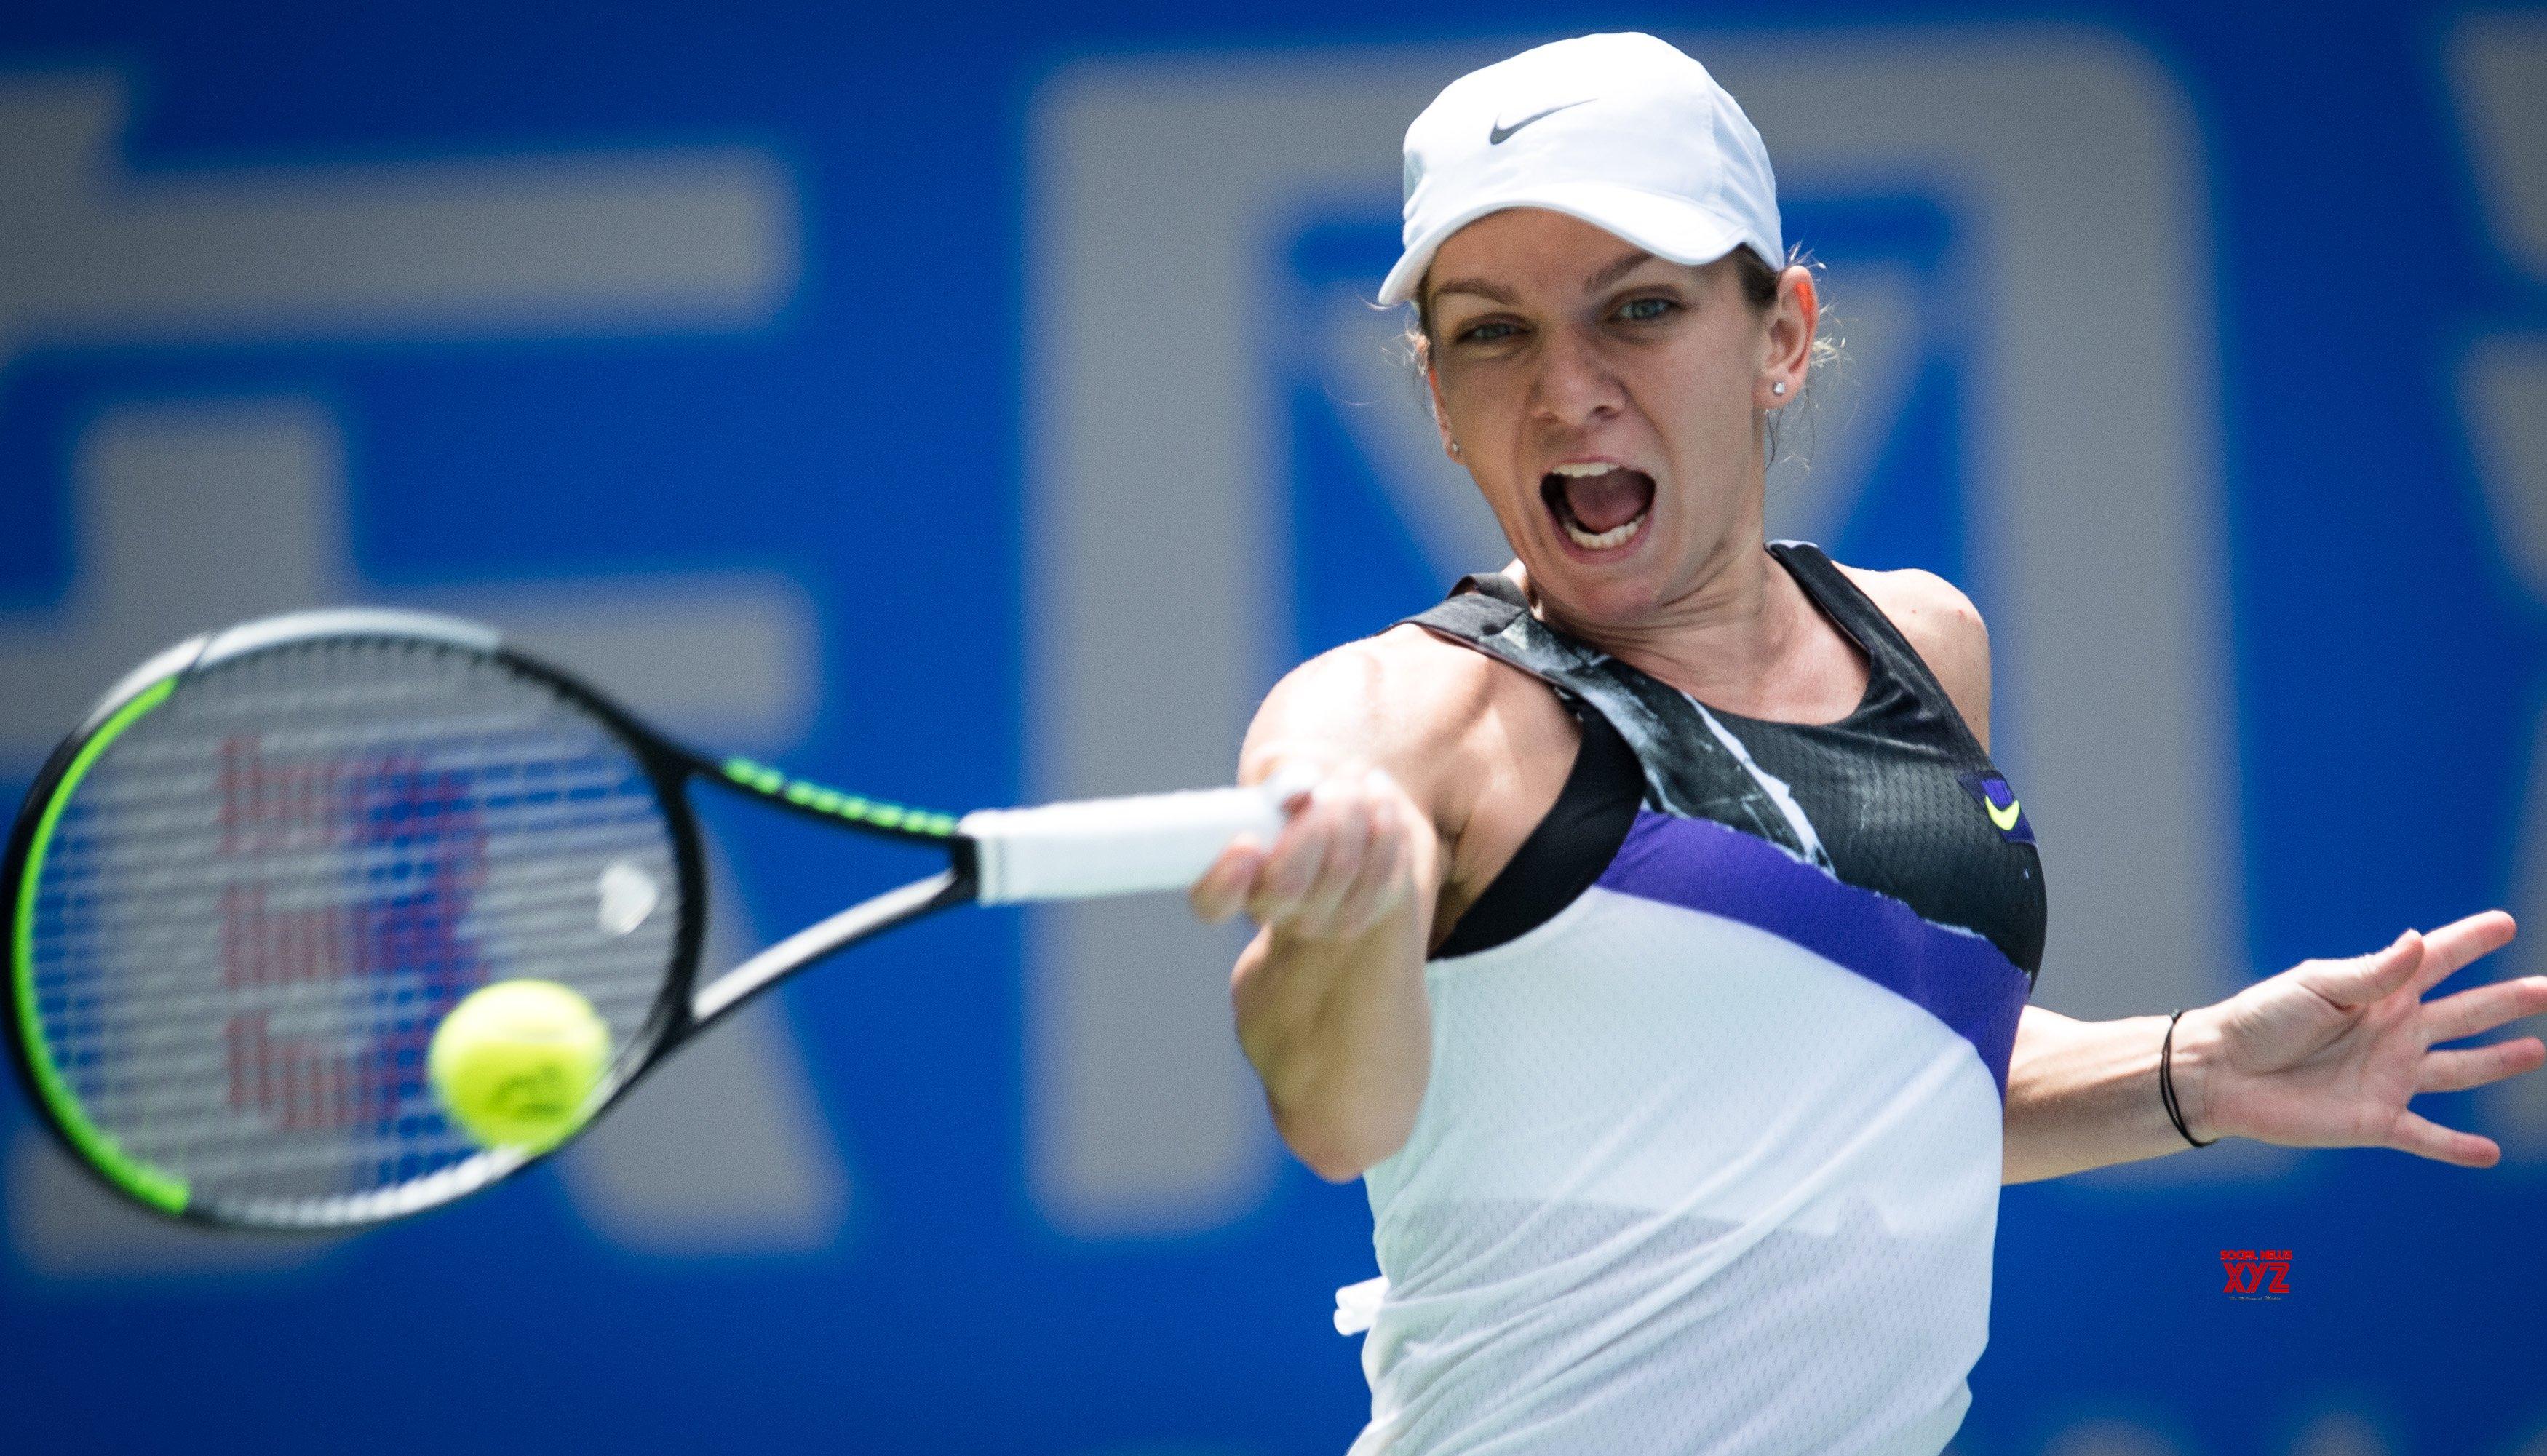 Simona Halep claims Rome title after Karolina Pliskova retires injured